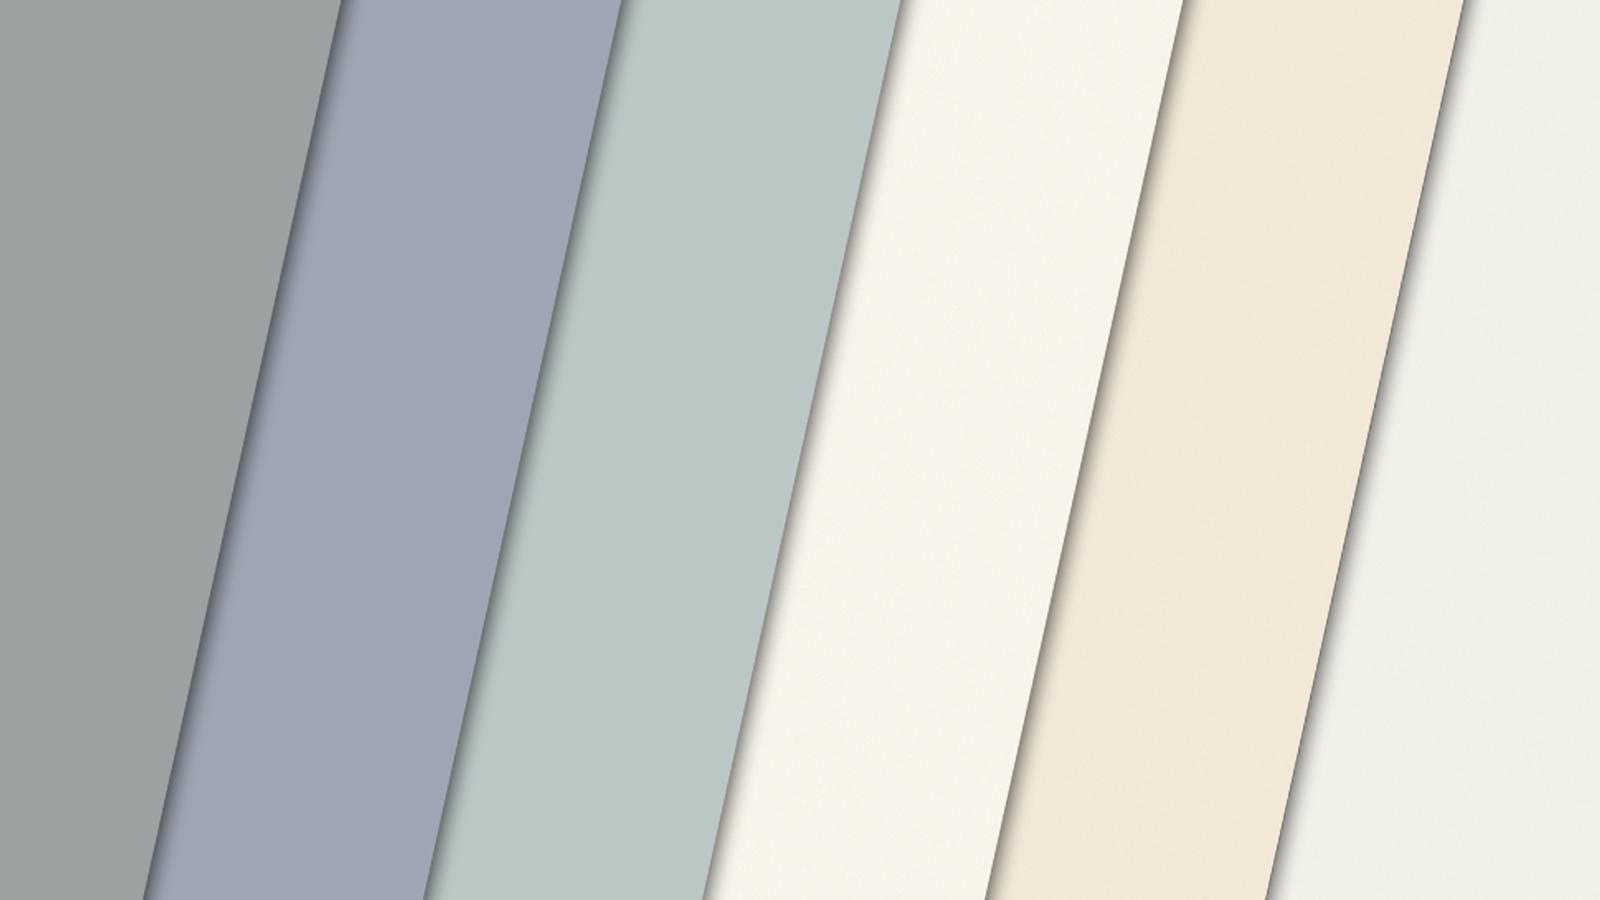 New Shower Walls Colors: Solids